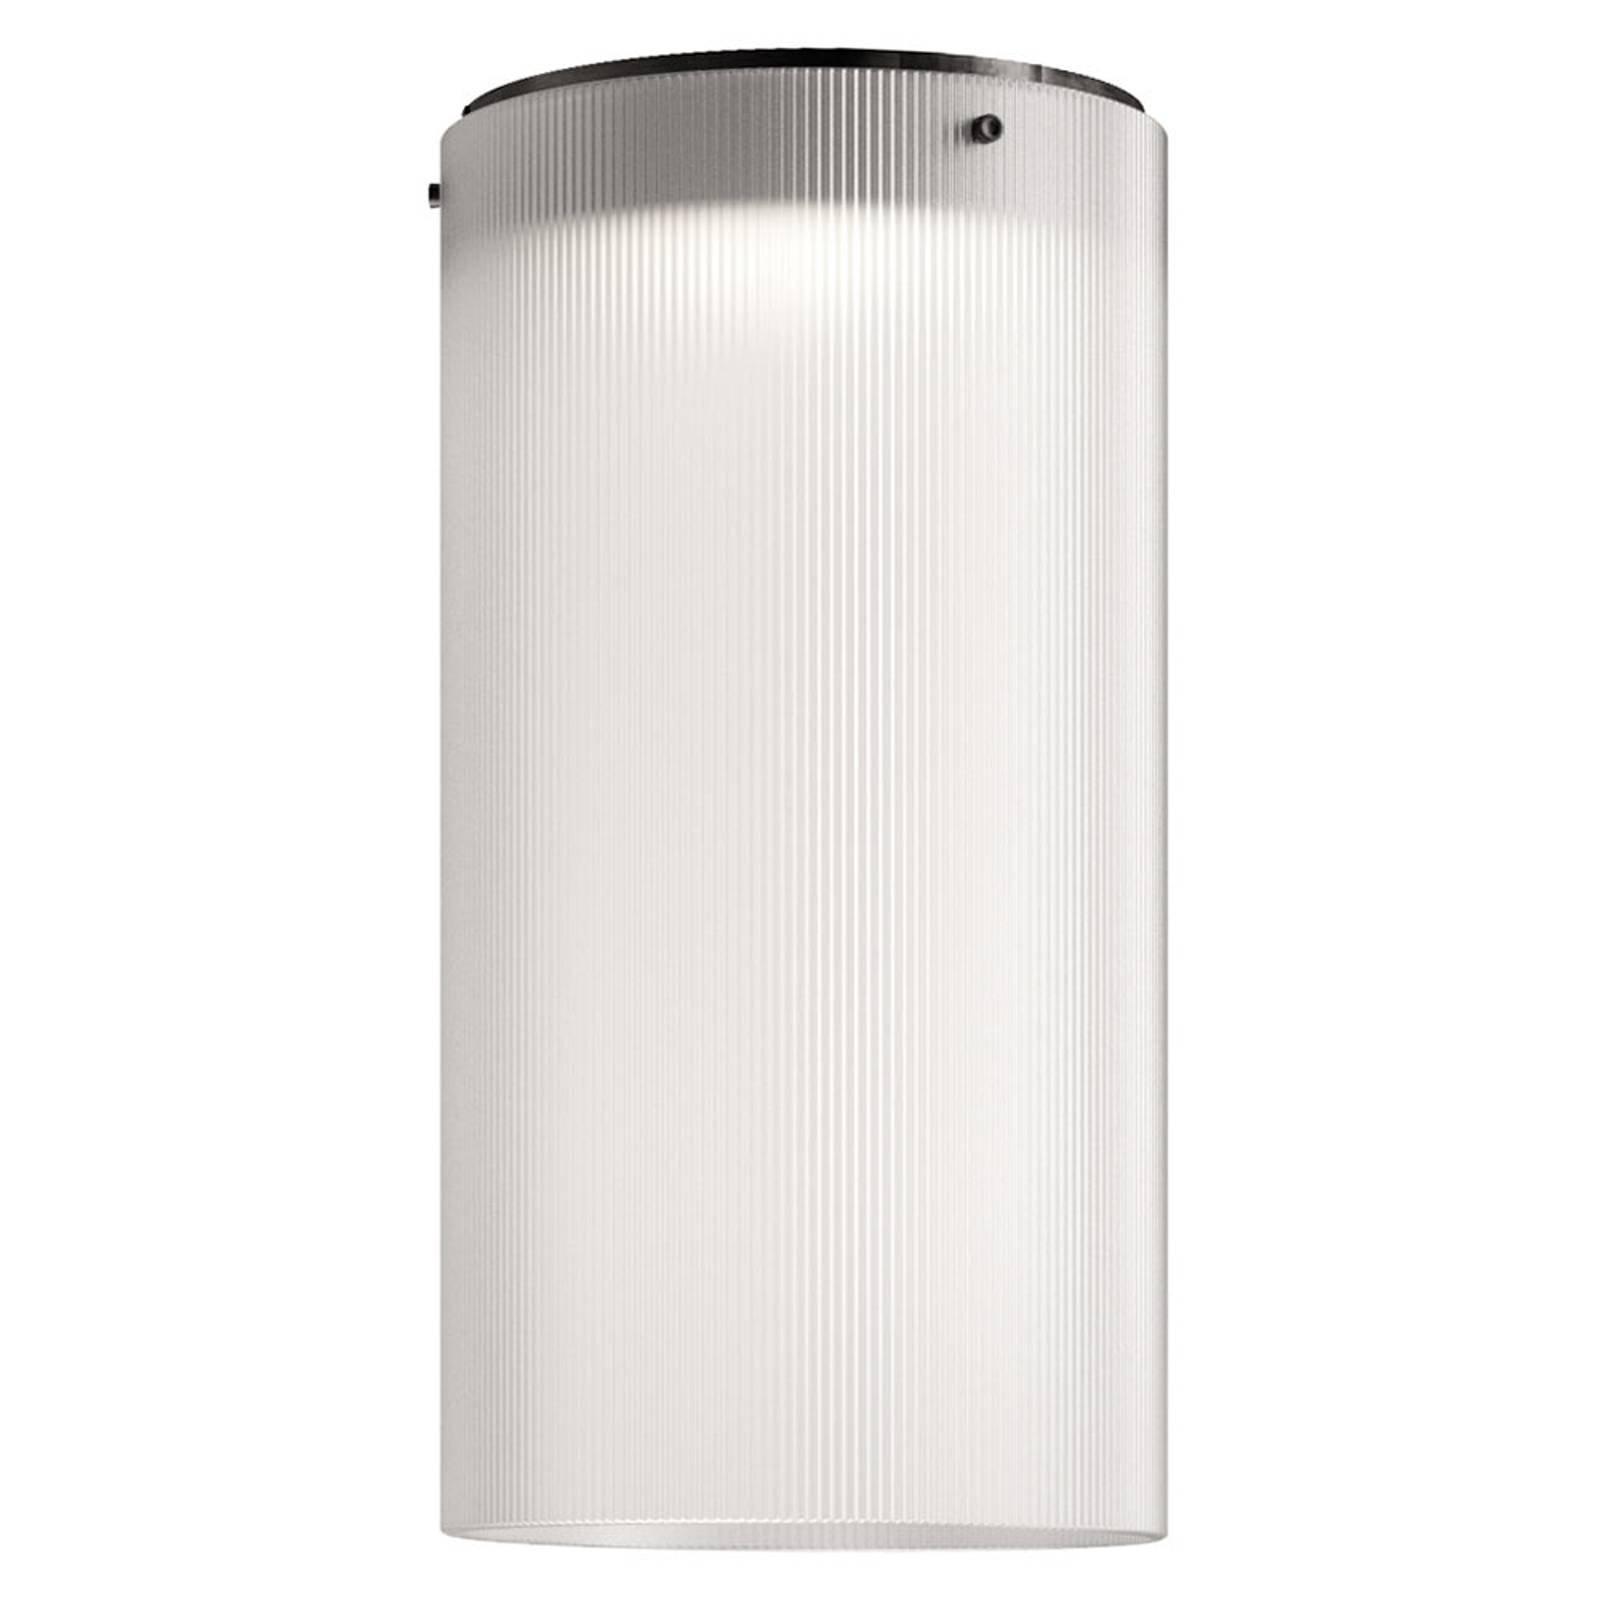 Kundalini Giass - LED-taklampe, Ø 25 cm, hvit